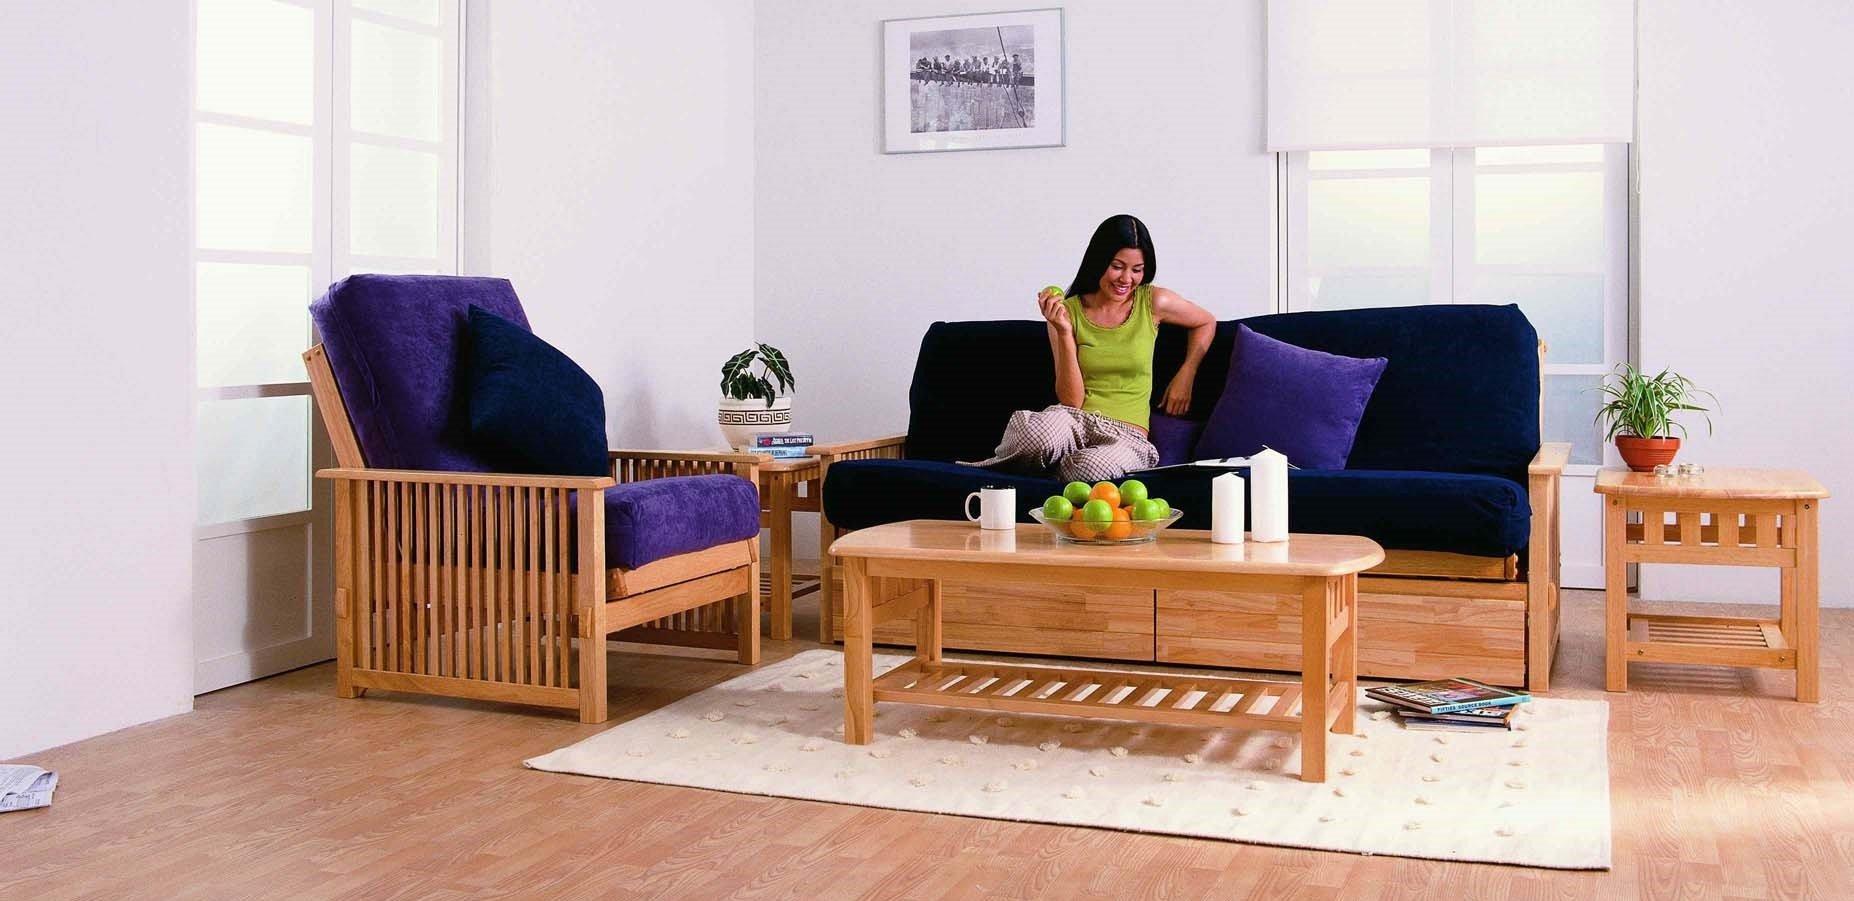 buy chair covers edmonton step 2 desk futon 2000